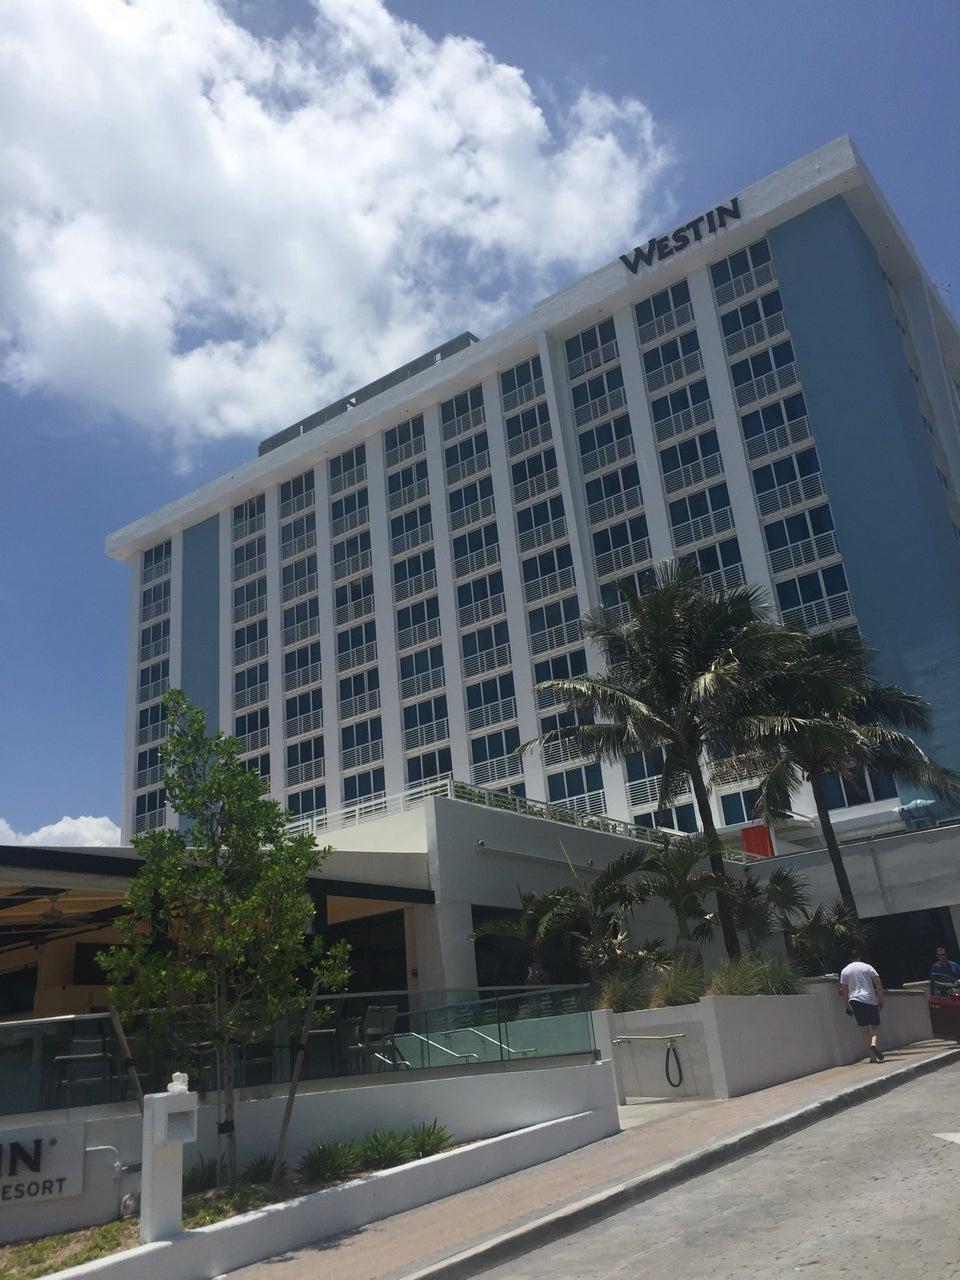 The Westin Fort Lauderdale Beach Resort Photos